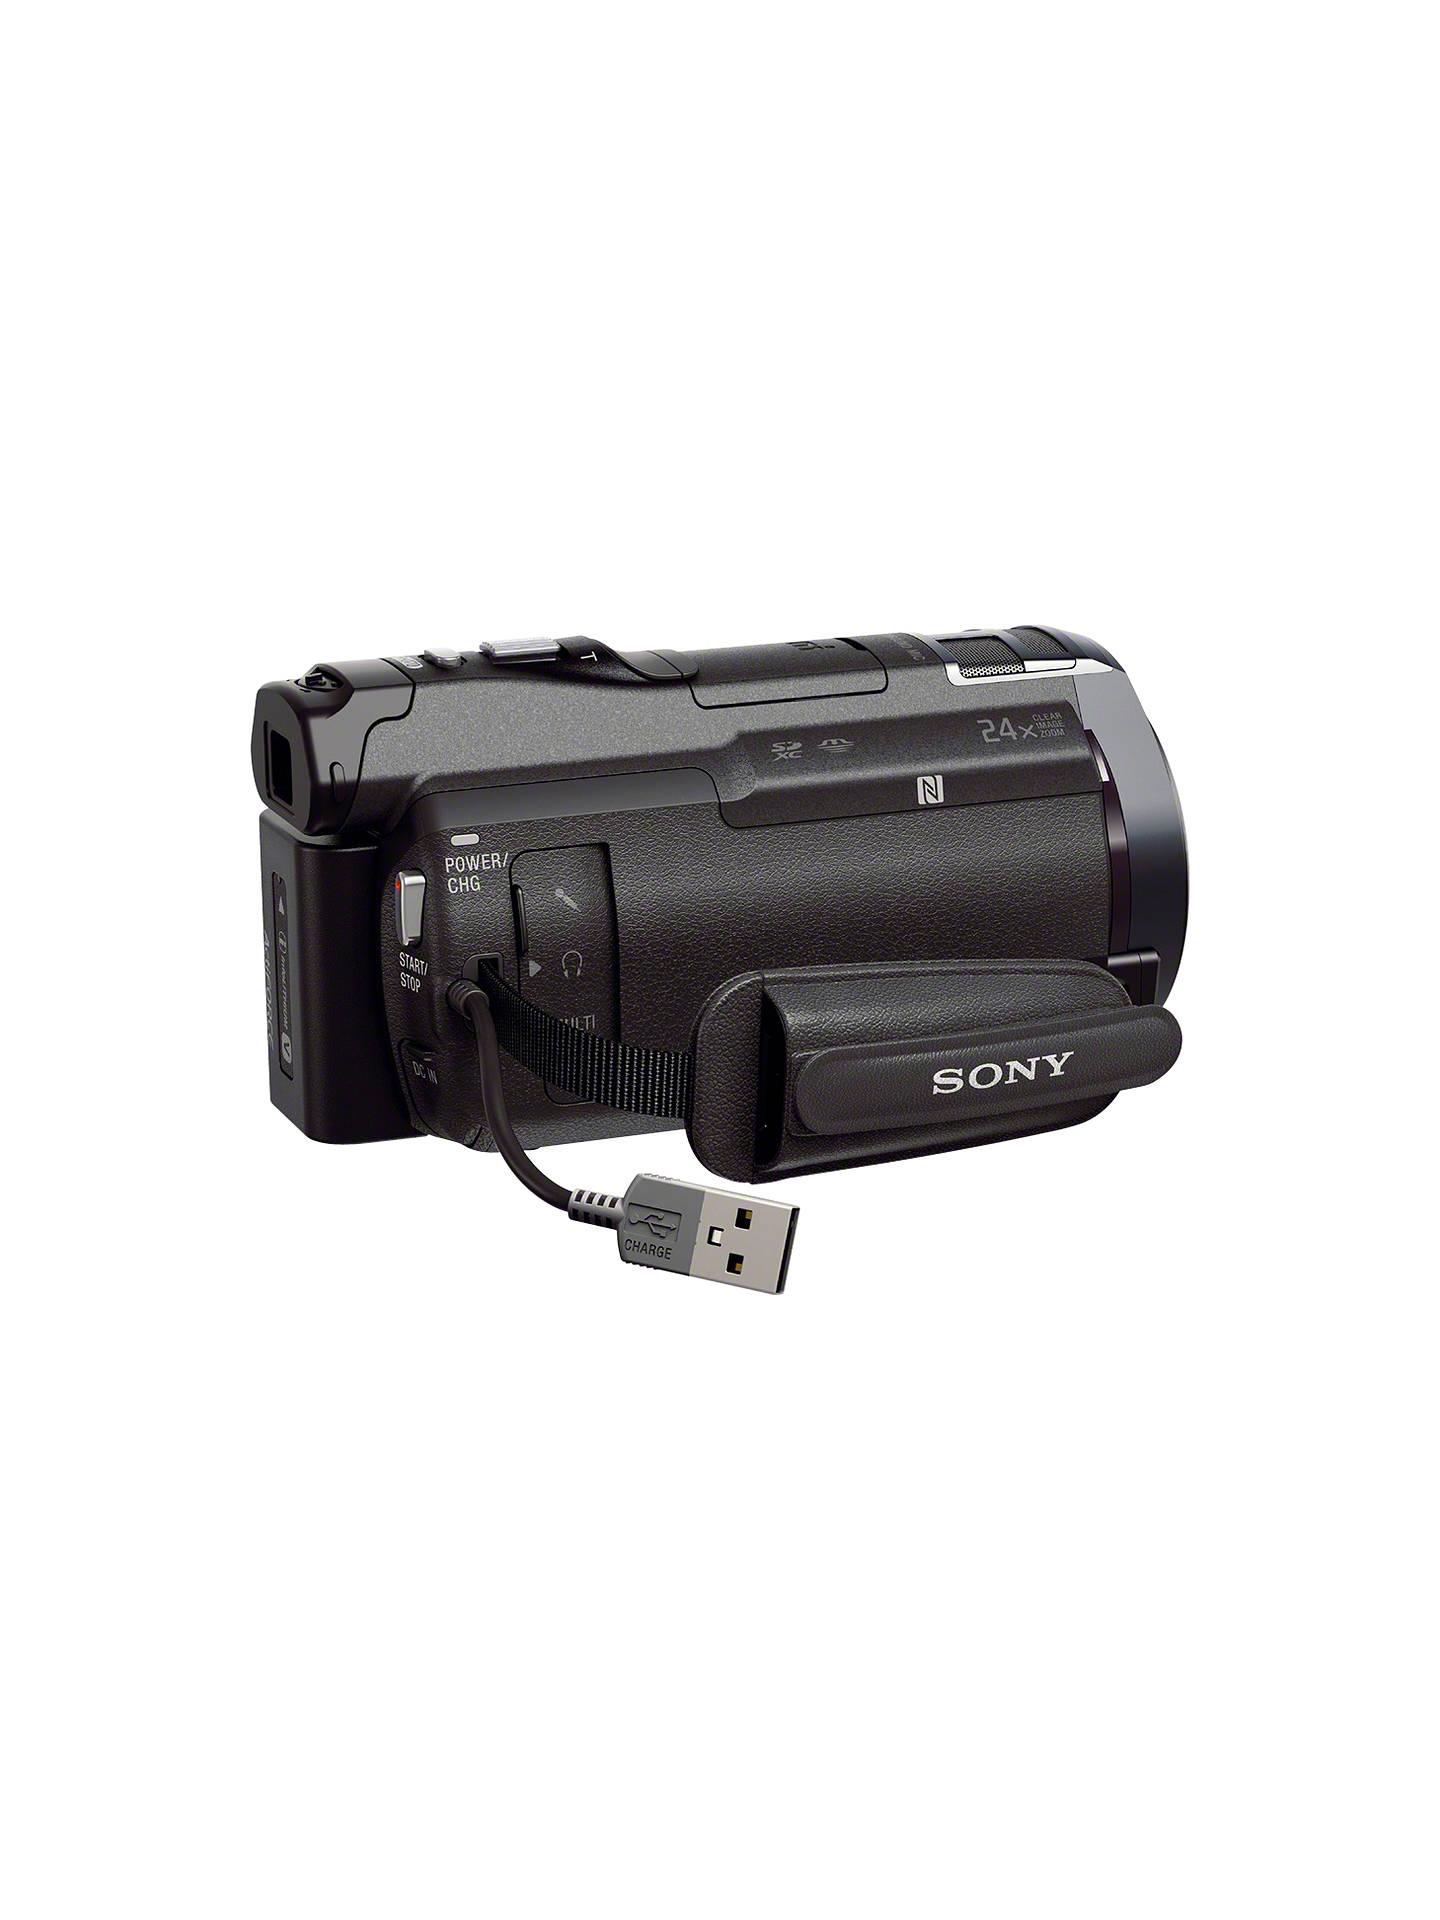 Sony Hdr Pj810e Hd 1080p Camcorder 245mp 12x Optical Zoom Ois Pj810 Handycam Buysony